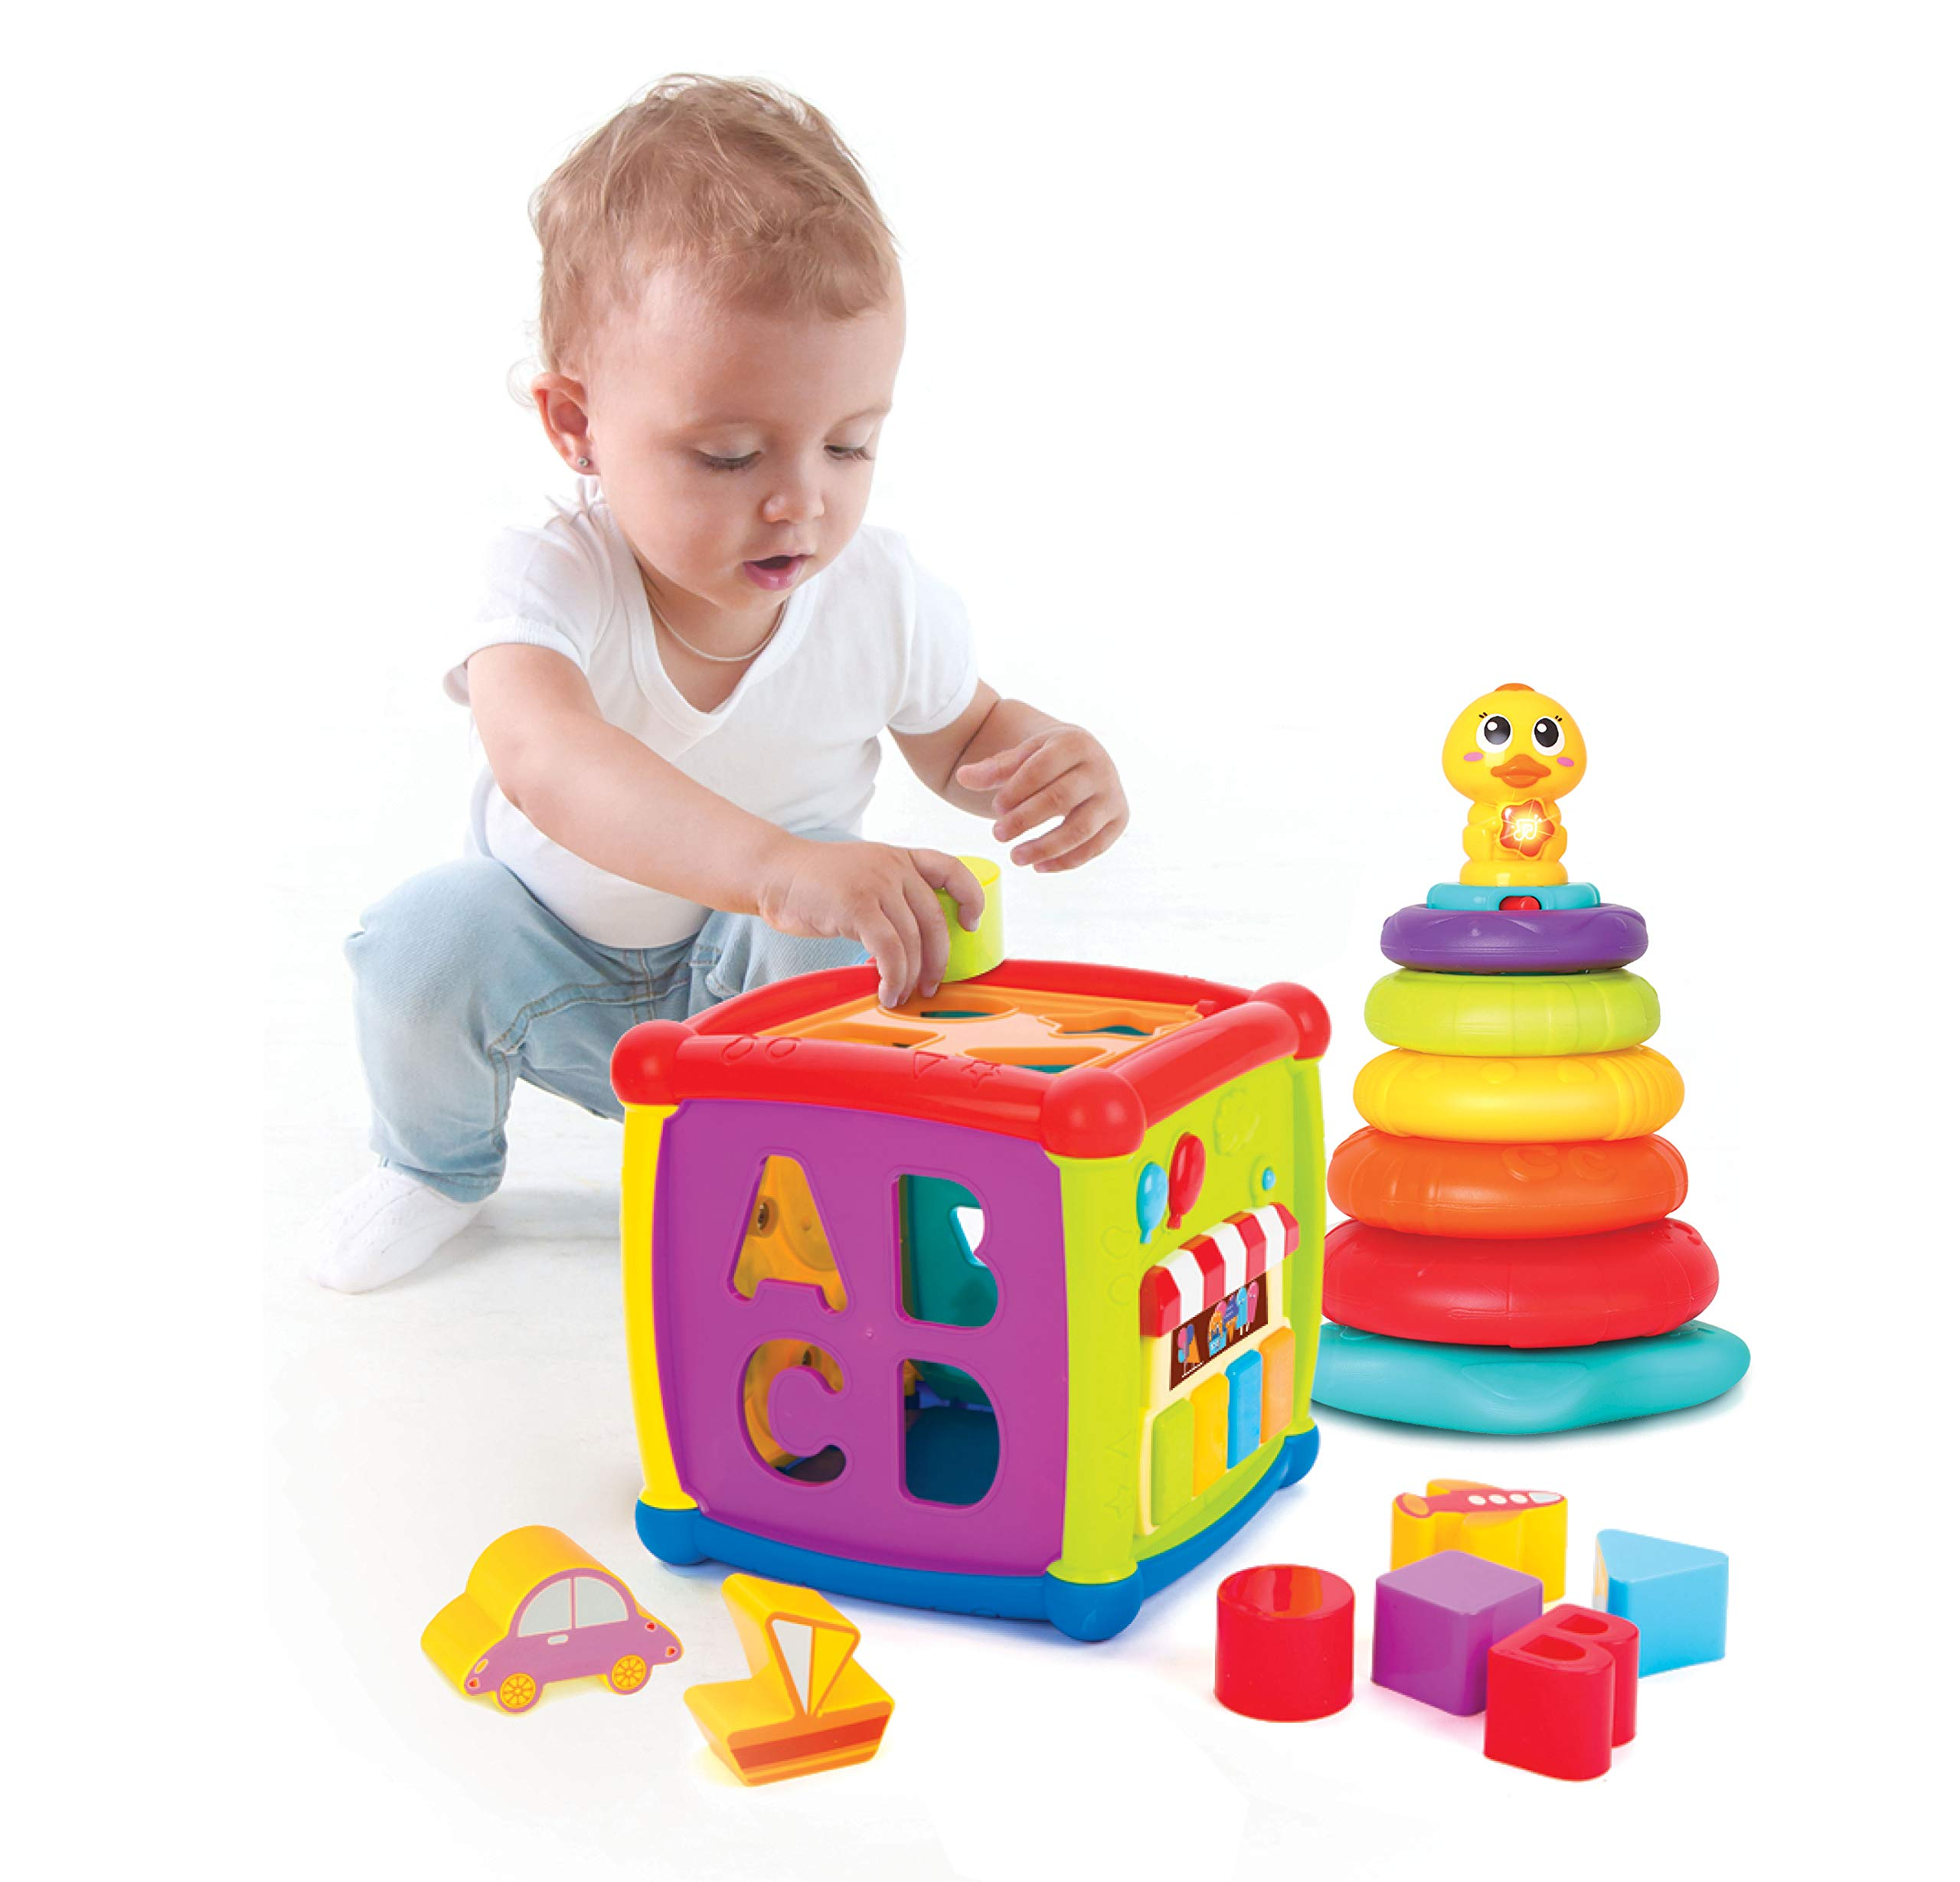 JOYIN Baby Activity Center Flashing Baby Stack Toys with Shape Color Sorting Alphabet Activity Cube Music Cute Toys by JOYIN (Image #2)